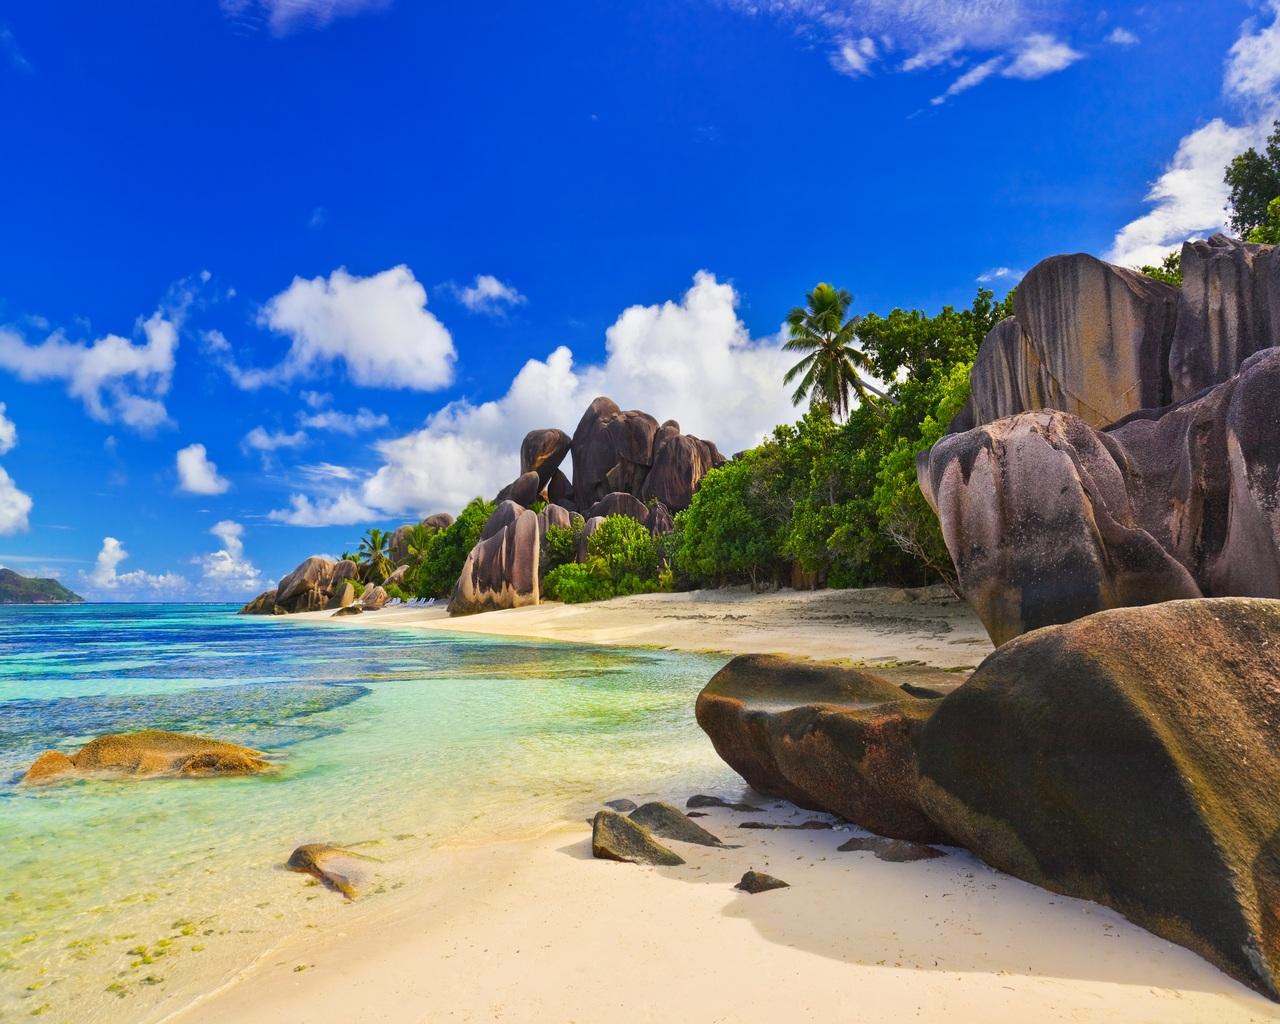 Island Paradise Wallpaper Island Wallpape...